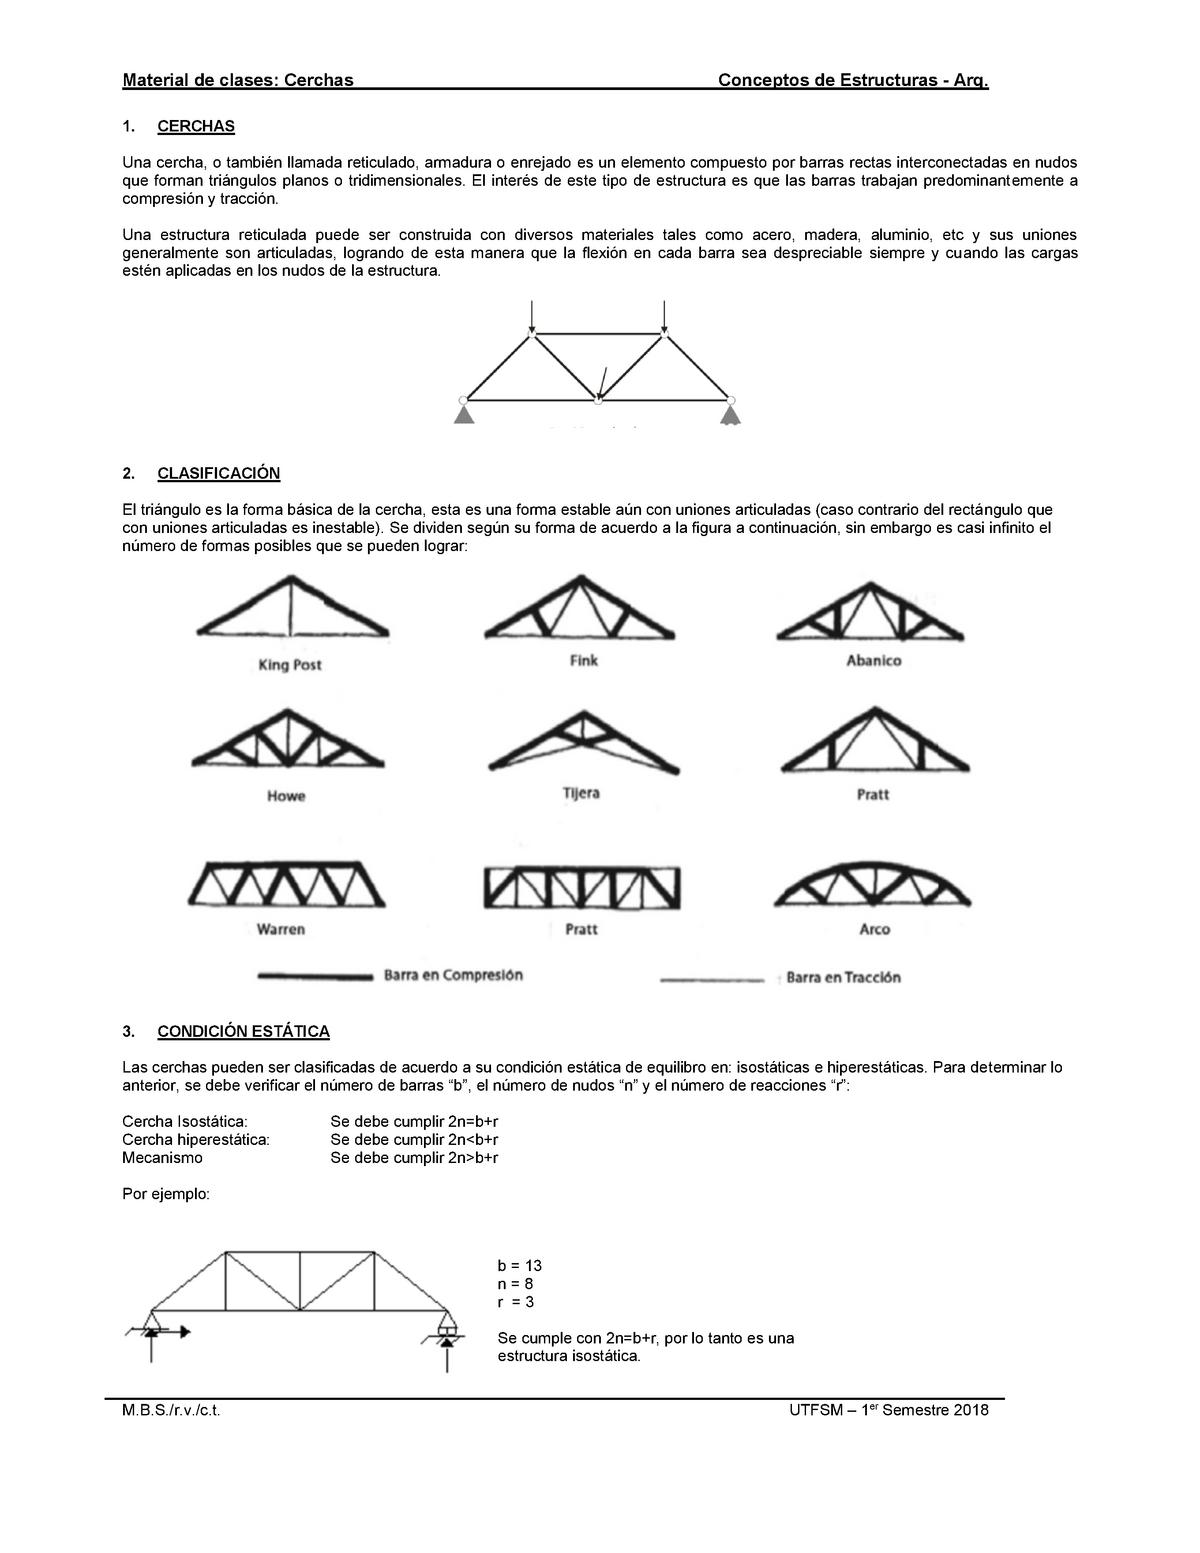 Capítulo Cerchas Conceptos De Estructuras Utfsm Studocu